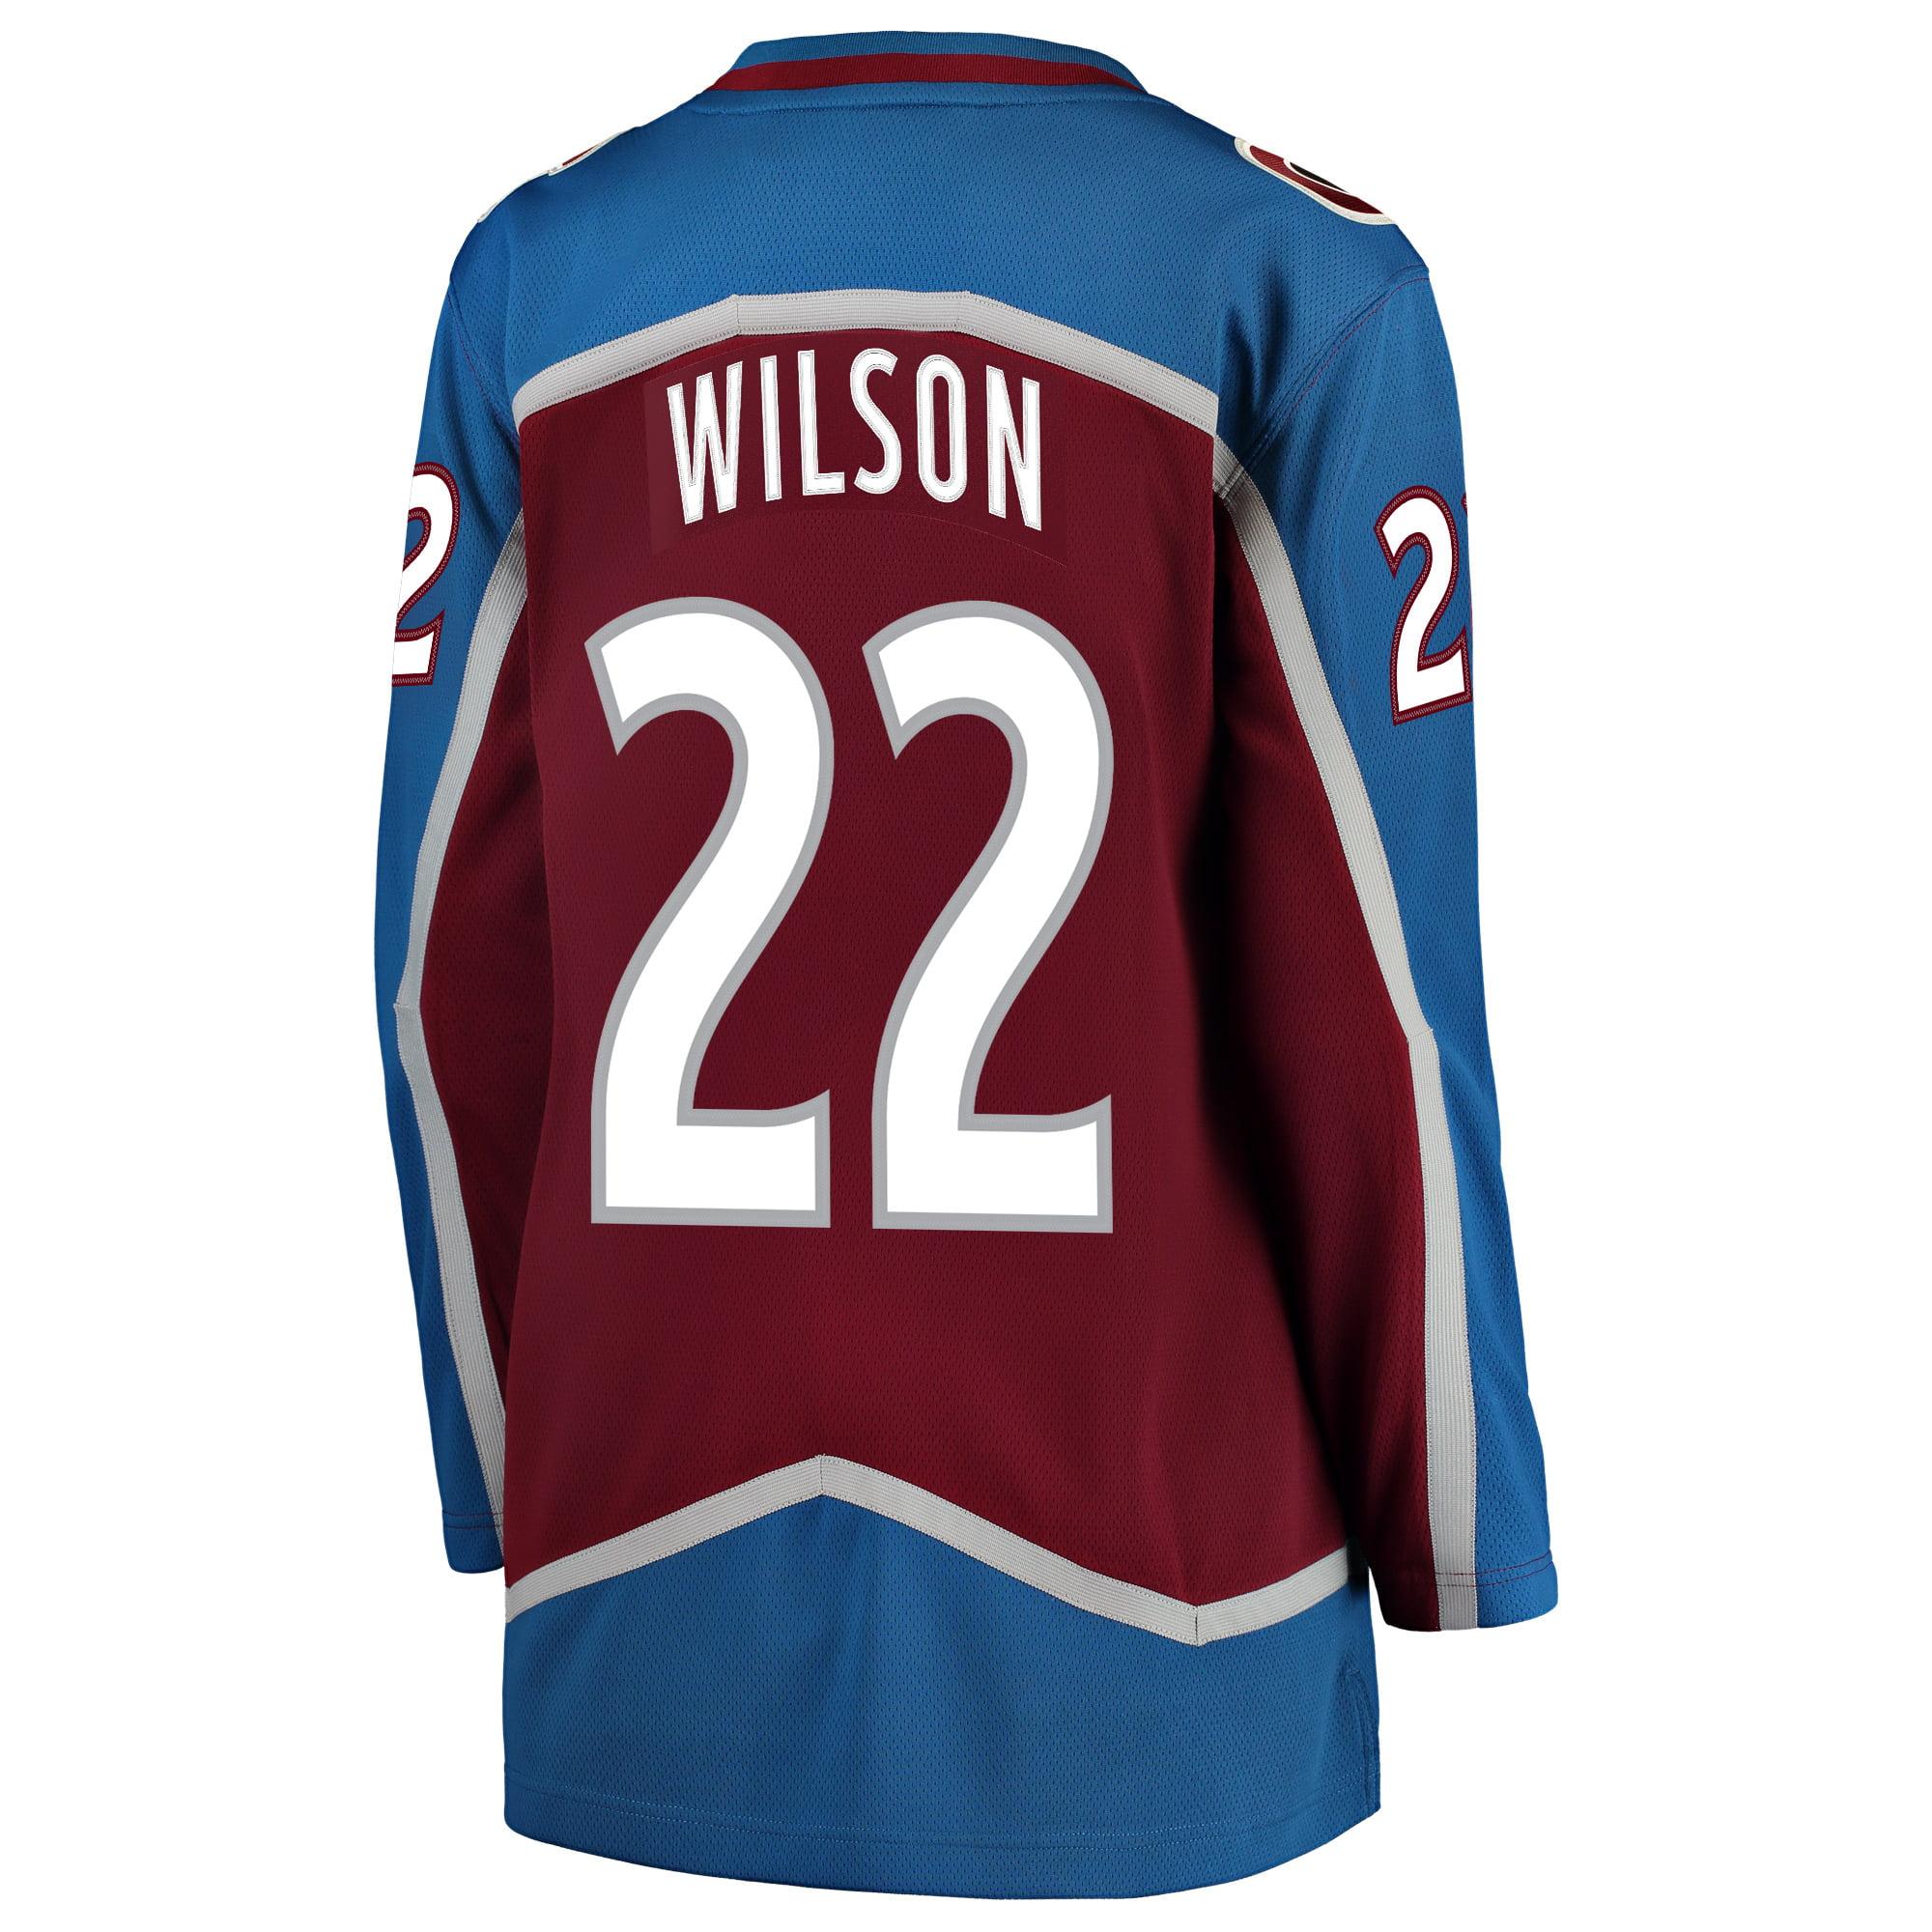 sale retailer bce74 b0486 Colin Wilson Colorado Avalanche Fanatics Branded Women's Breakaway Player  Jersey - Burgundy